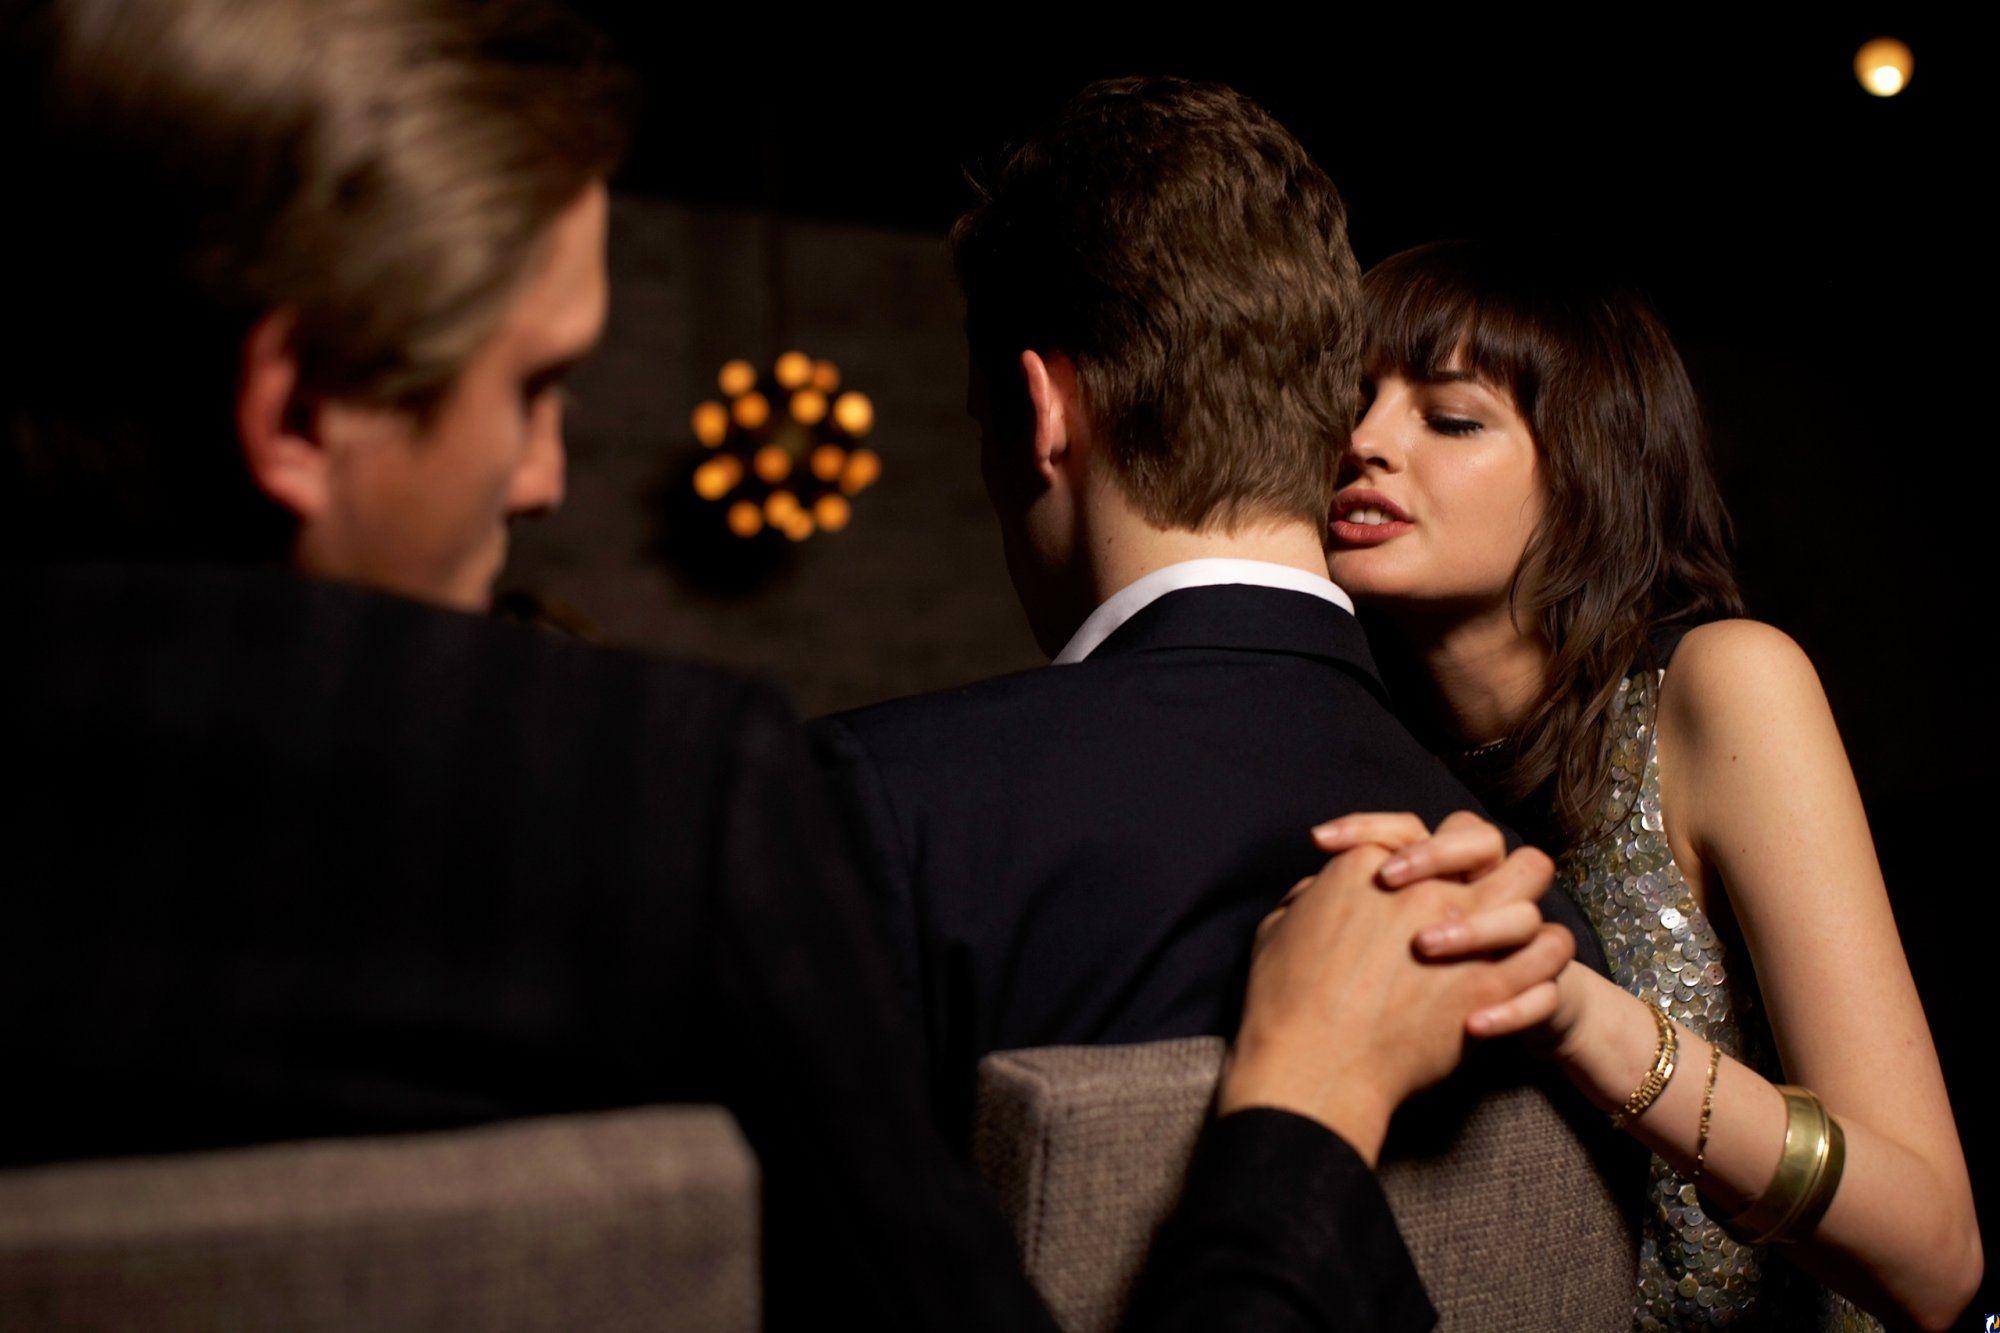 affair_dating_11